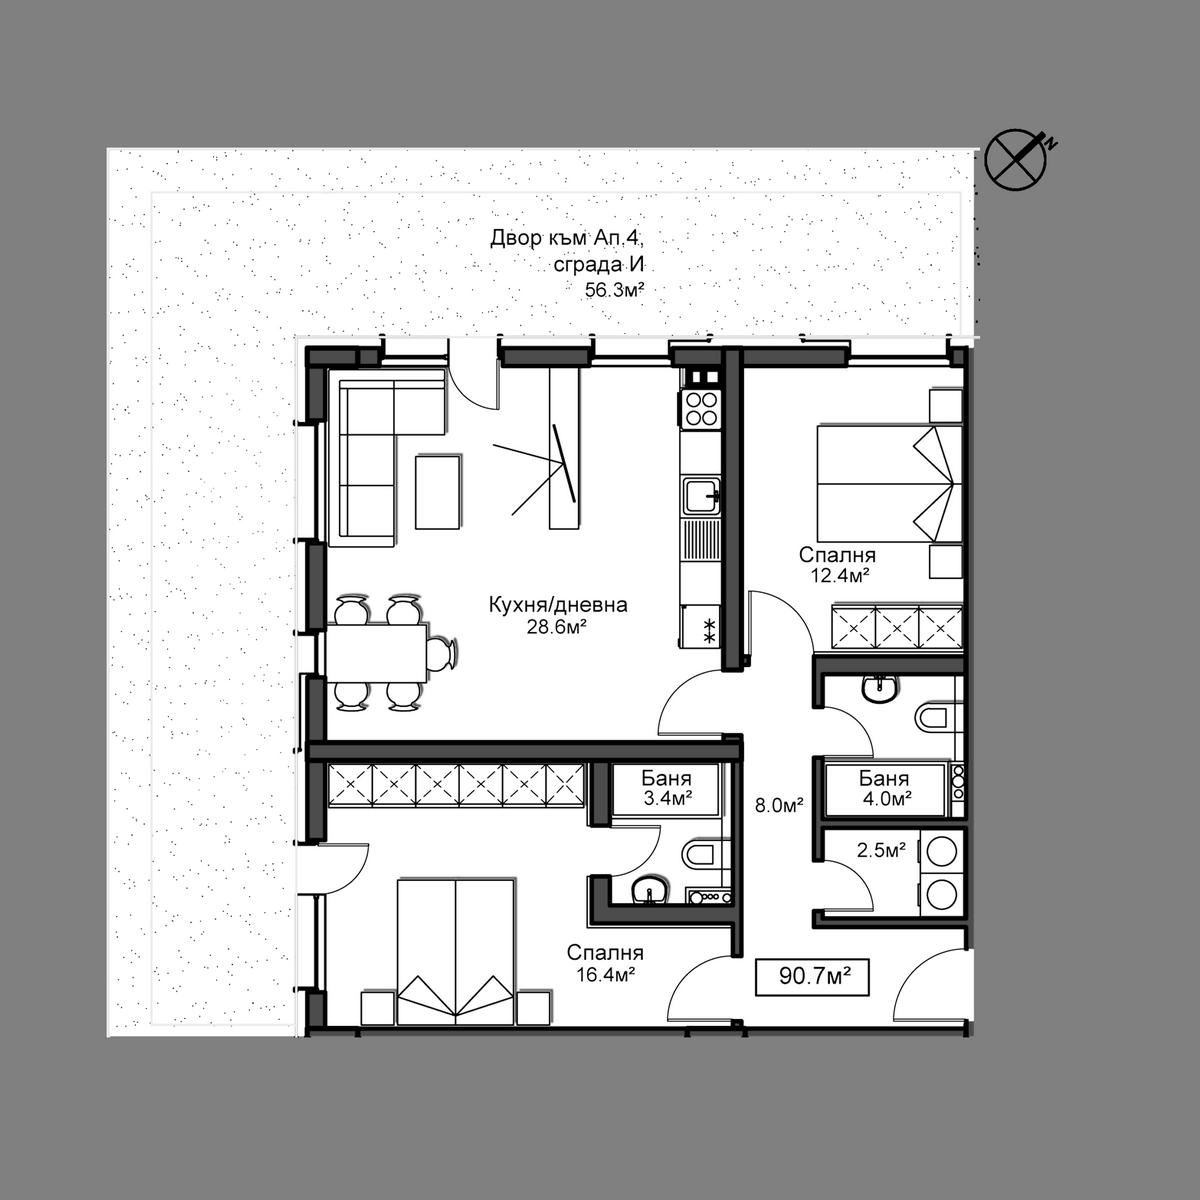 Продава апартамент ново строителство - Апартамент 4